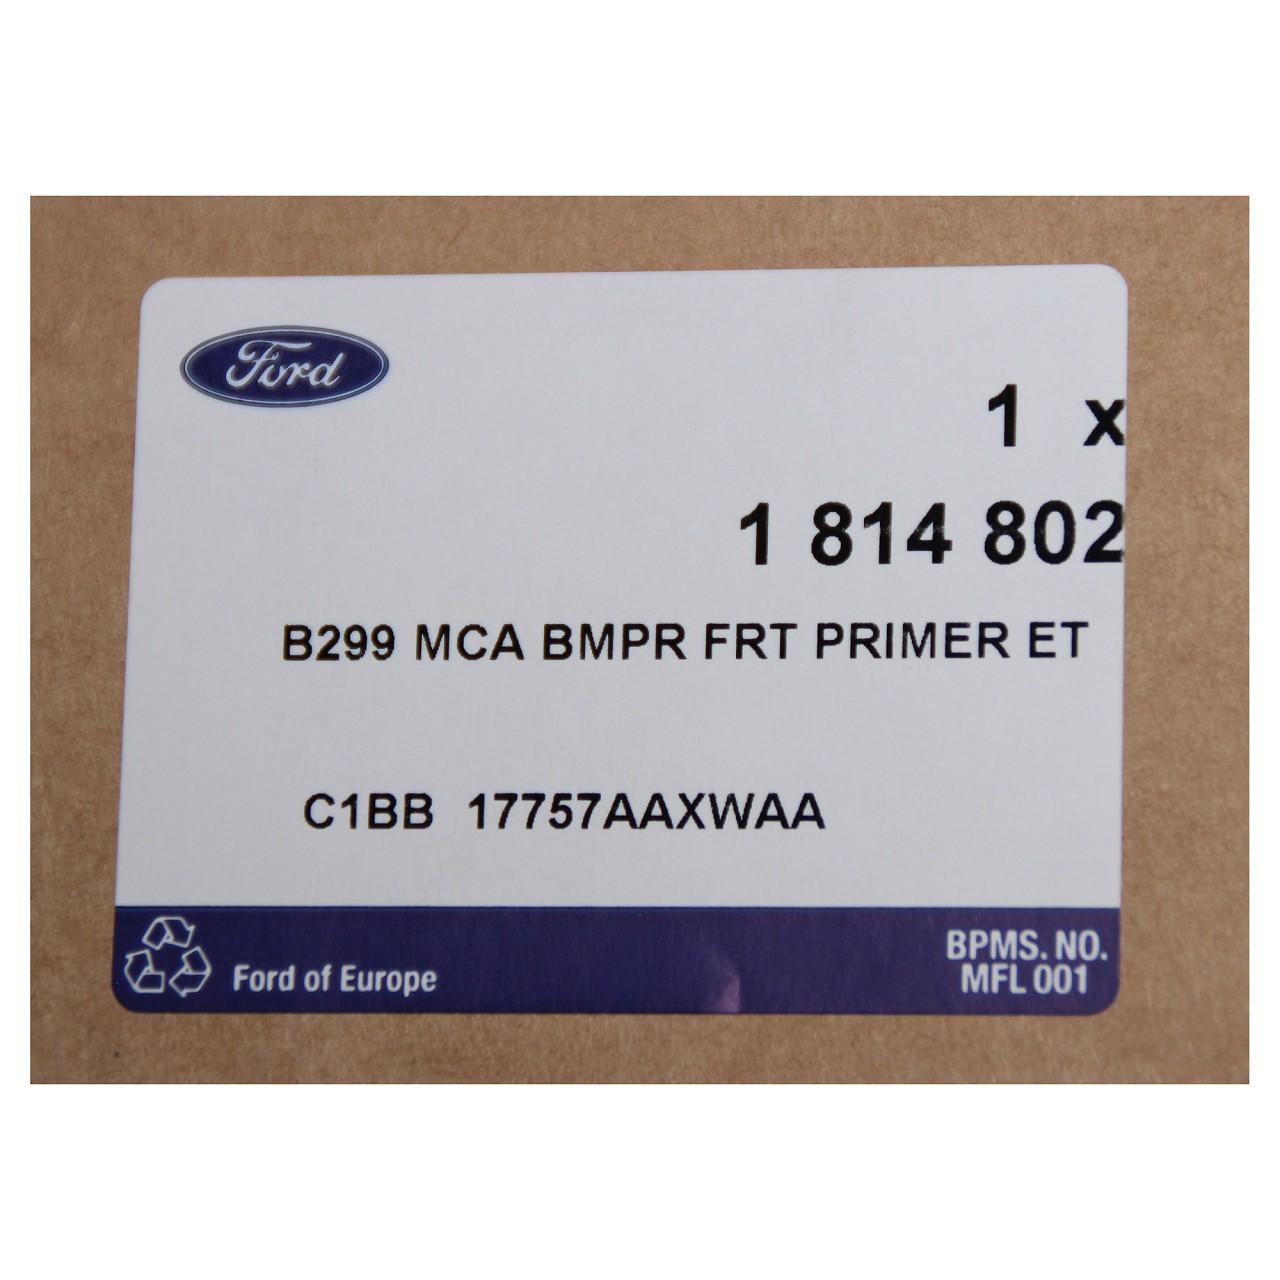 ORIGINAL Ford Stoßstange Stoßfänger FIESTA VI MK6 ab 10.2012 vorne 1814802